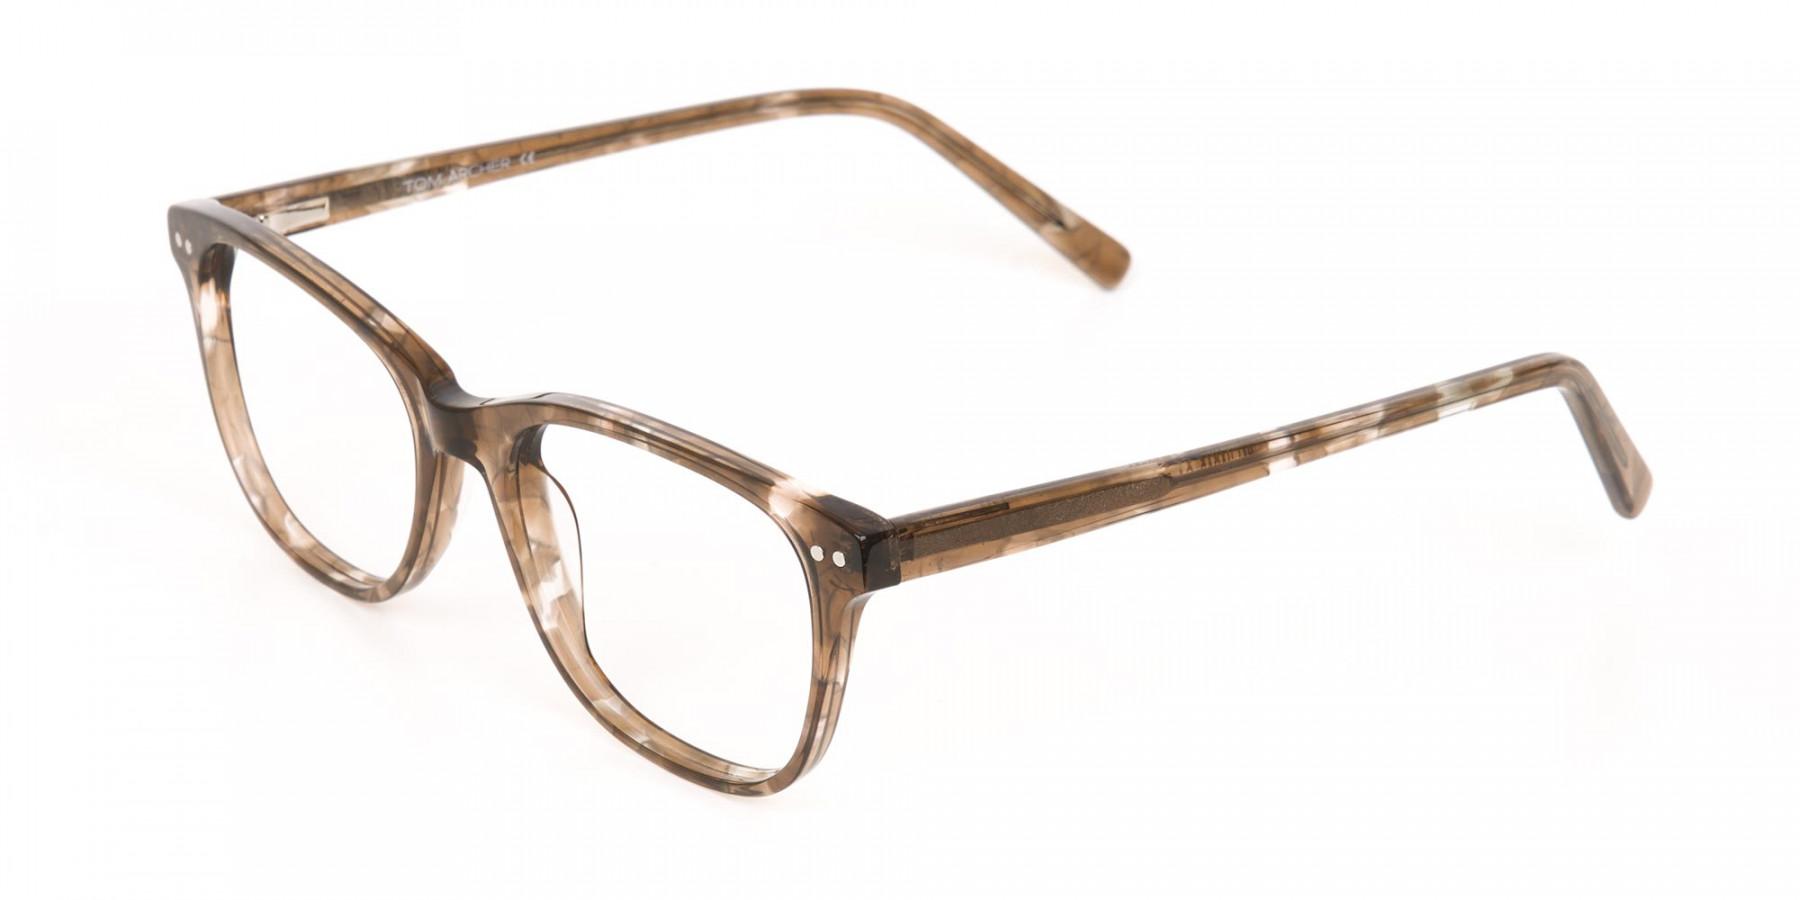 Beige Tortoise Acetate Rectangle Glasses Unisex-1